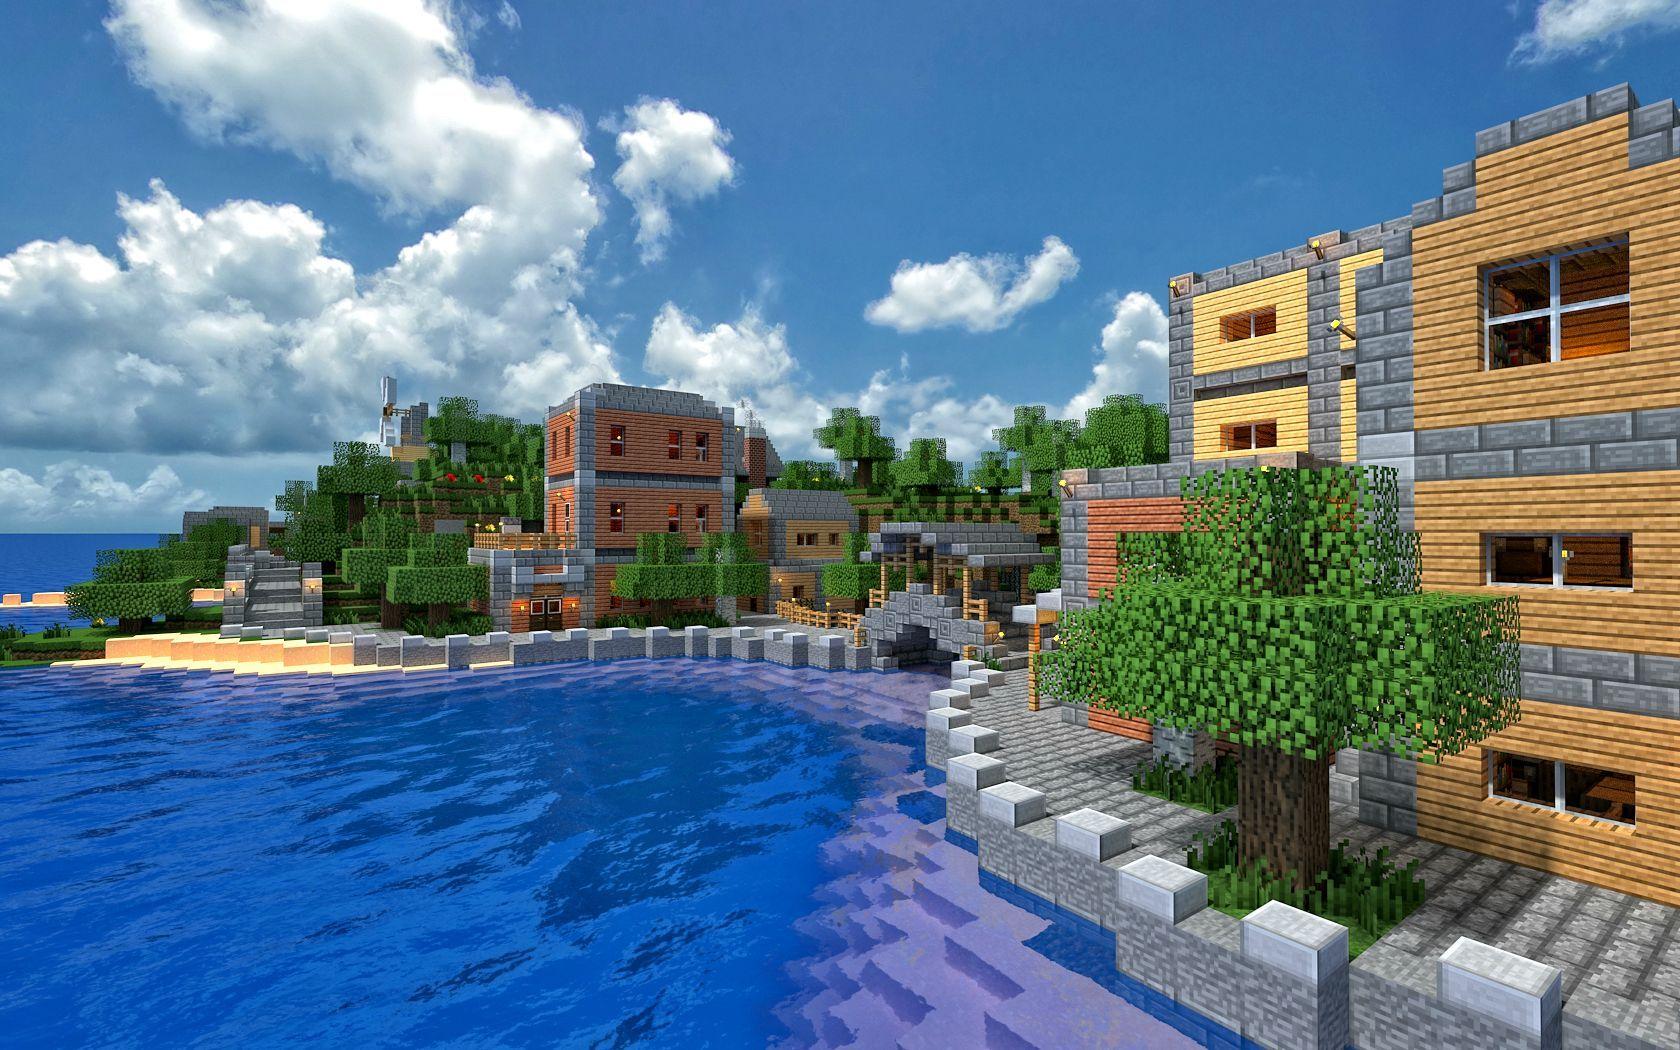 Minecraft City Waterfront